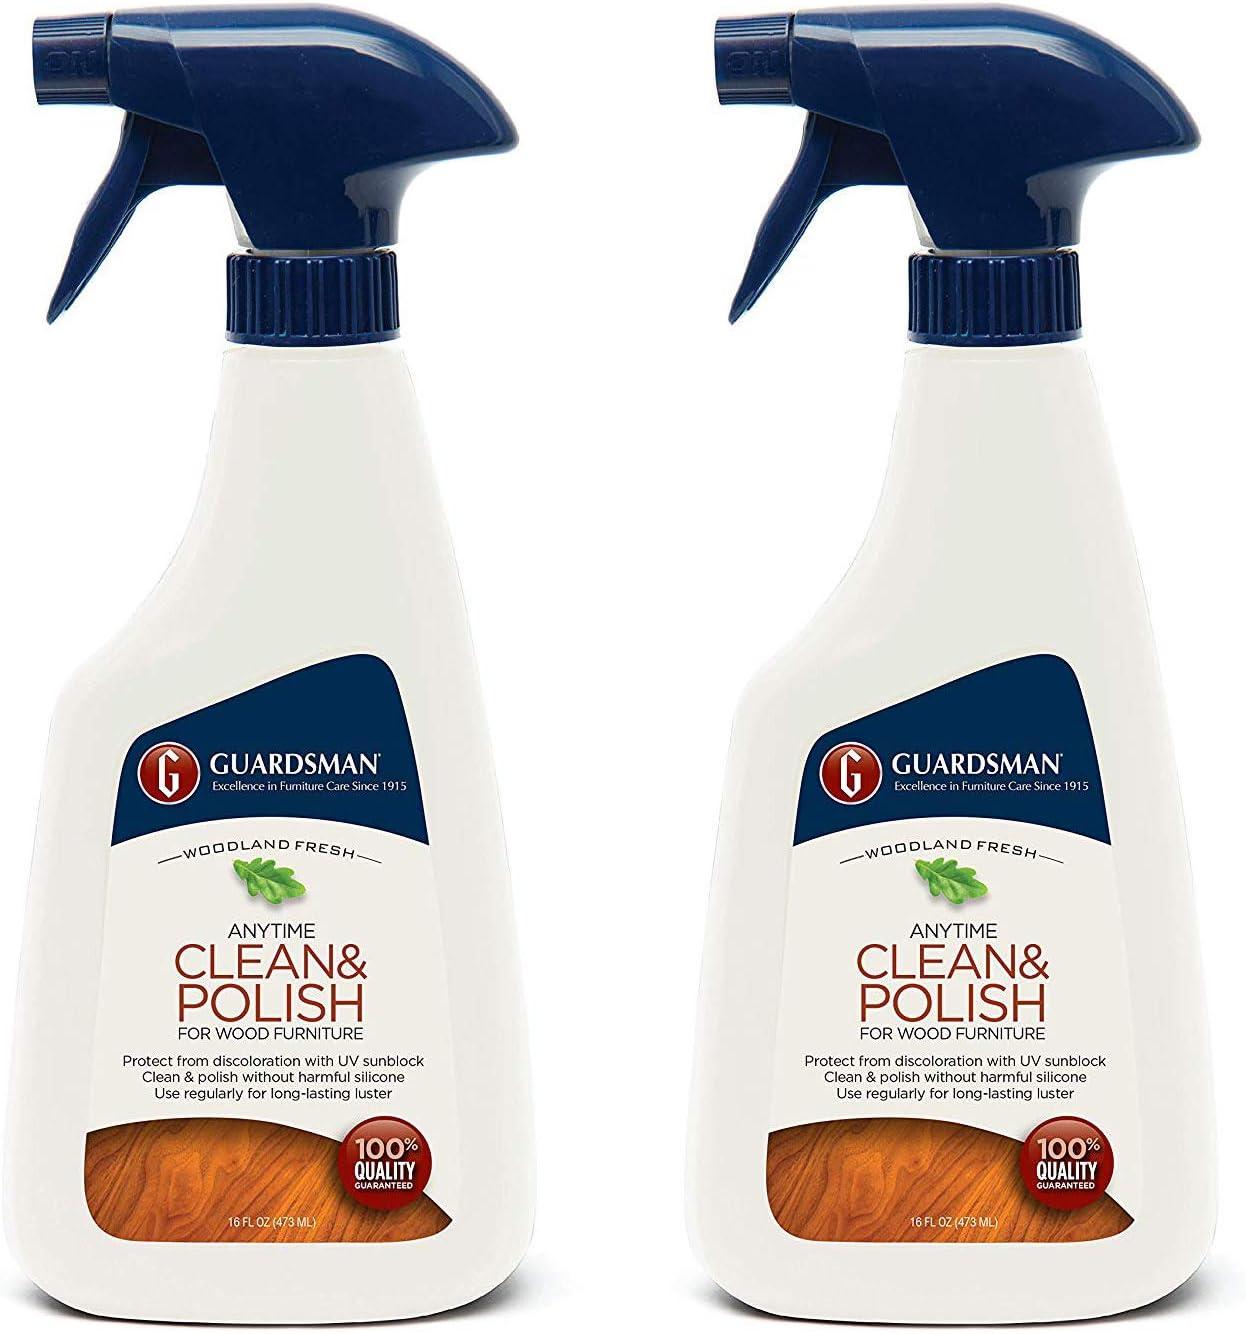 Guardsman Clean & Polish For Wood Furniture - Woodland Fresh - 16 oz Spray - Silicone Free, UV Protection - 2 Pack